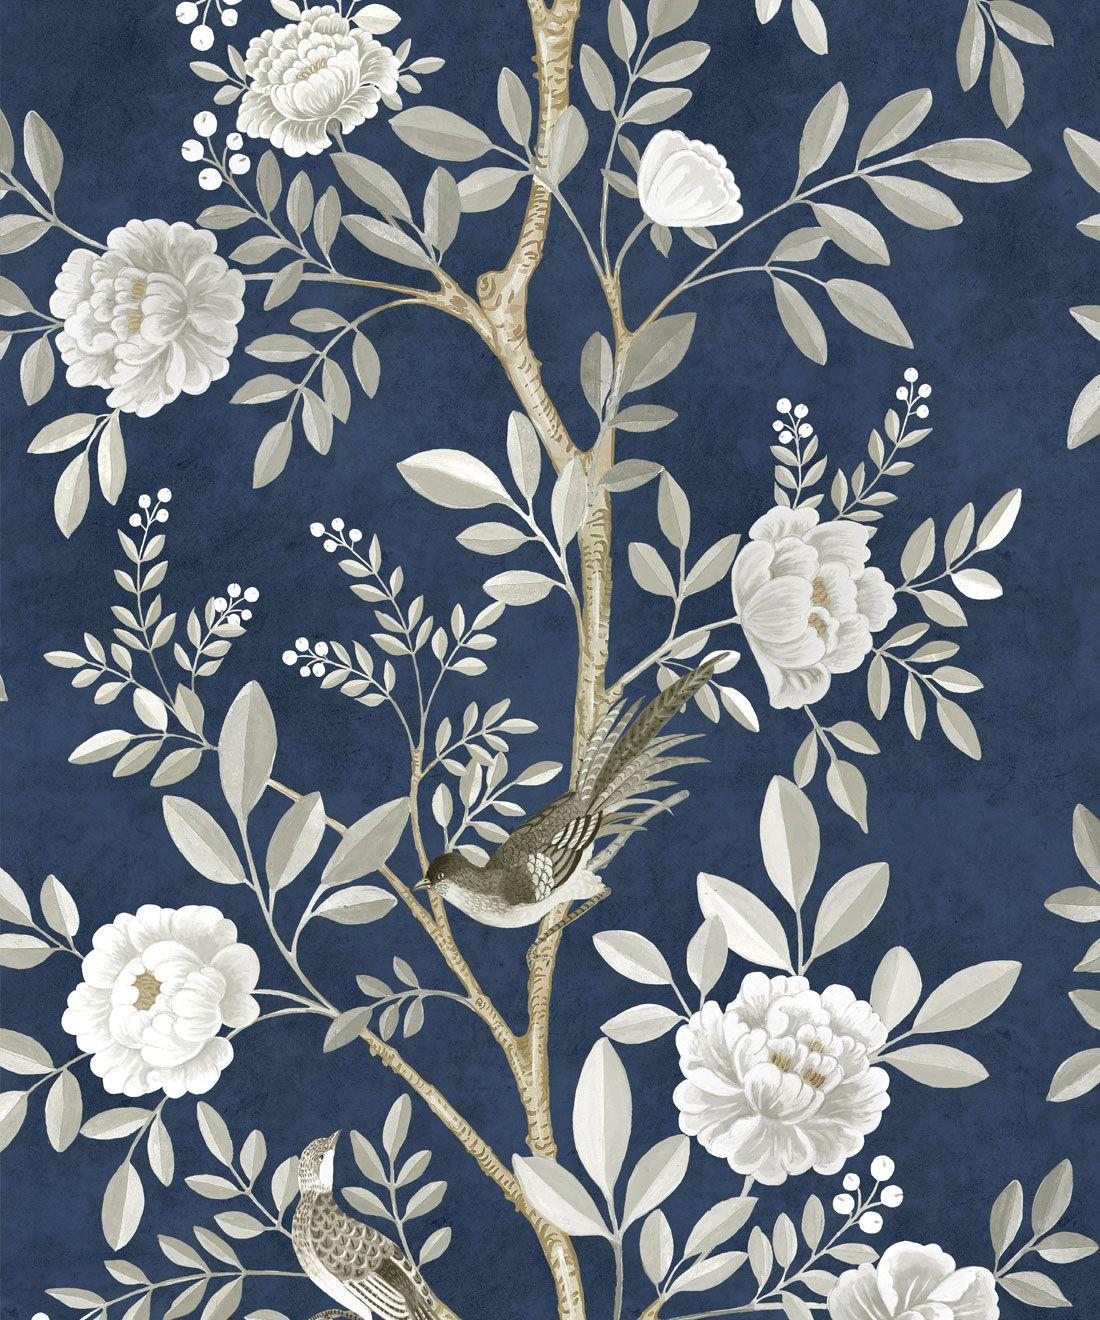 Chinoiserie Wallpaper •Floral Wallpaper •Bird Wallpaper • Magnolia • Royal Blue • Swatcj